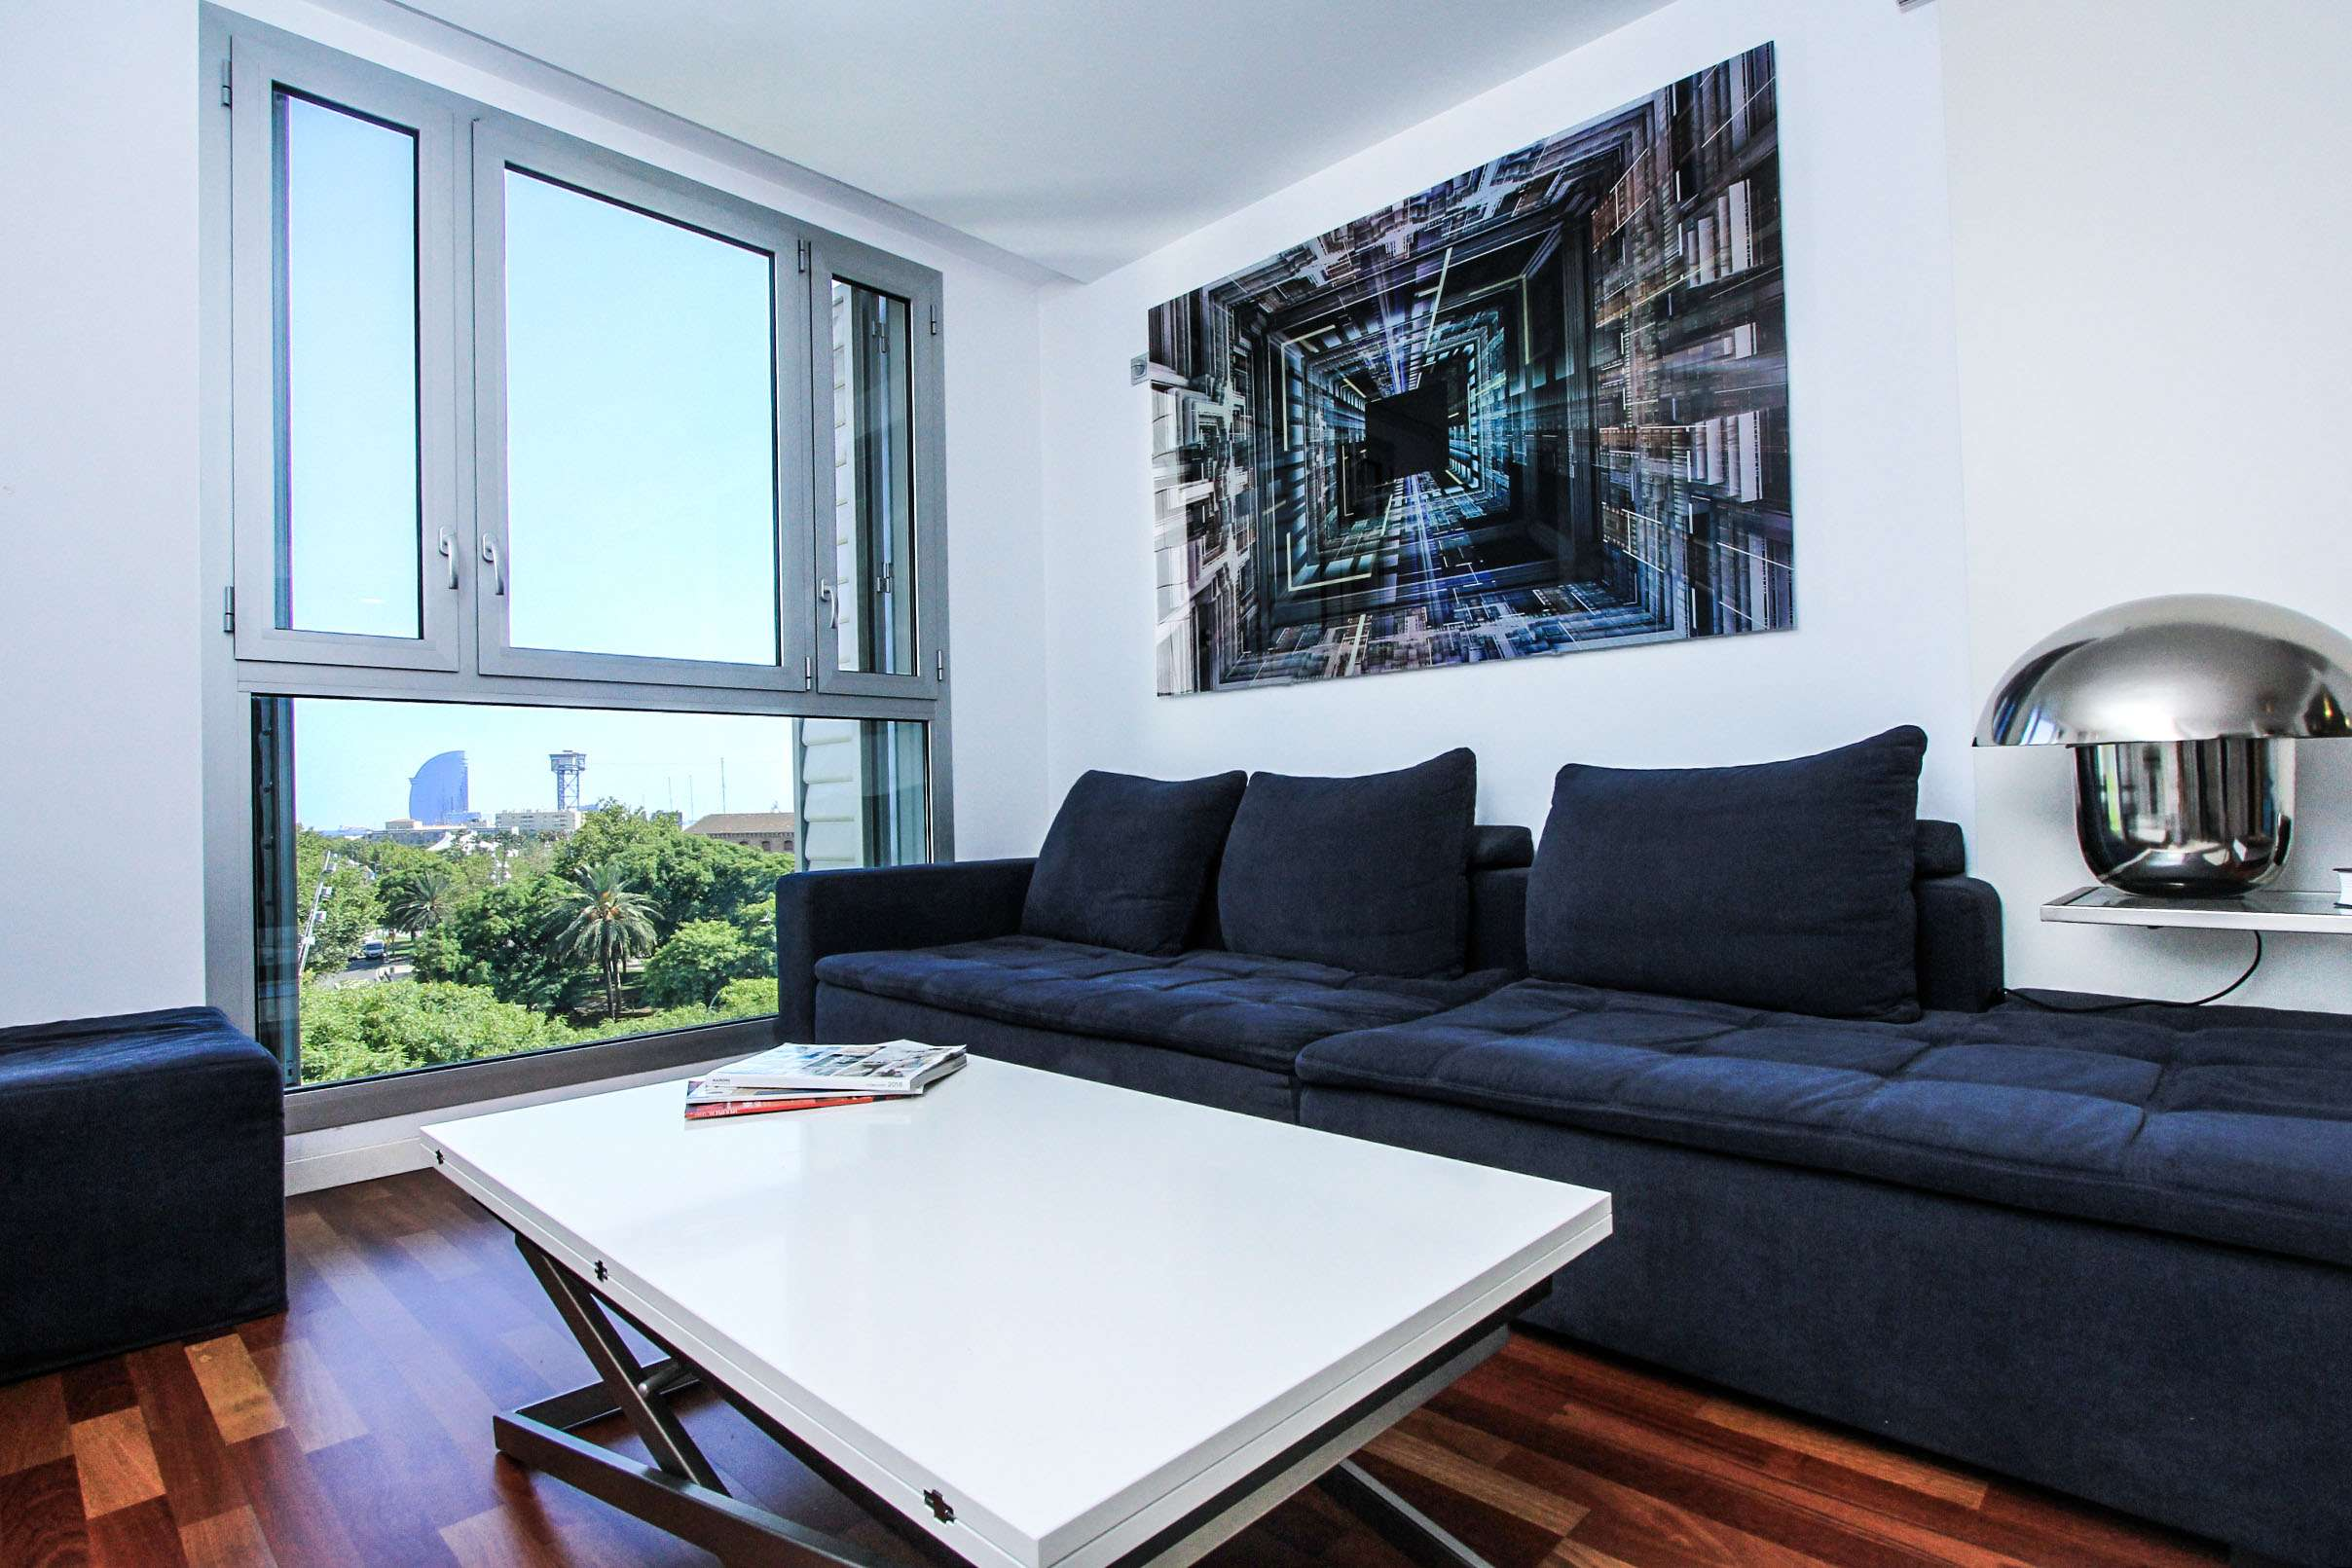 Stylish one bedroom apartment in Barceloneta